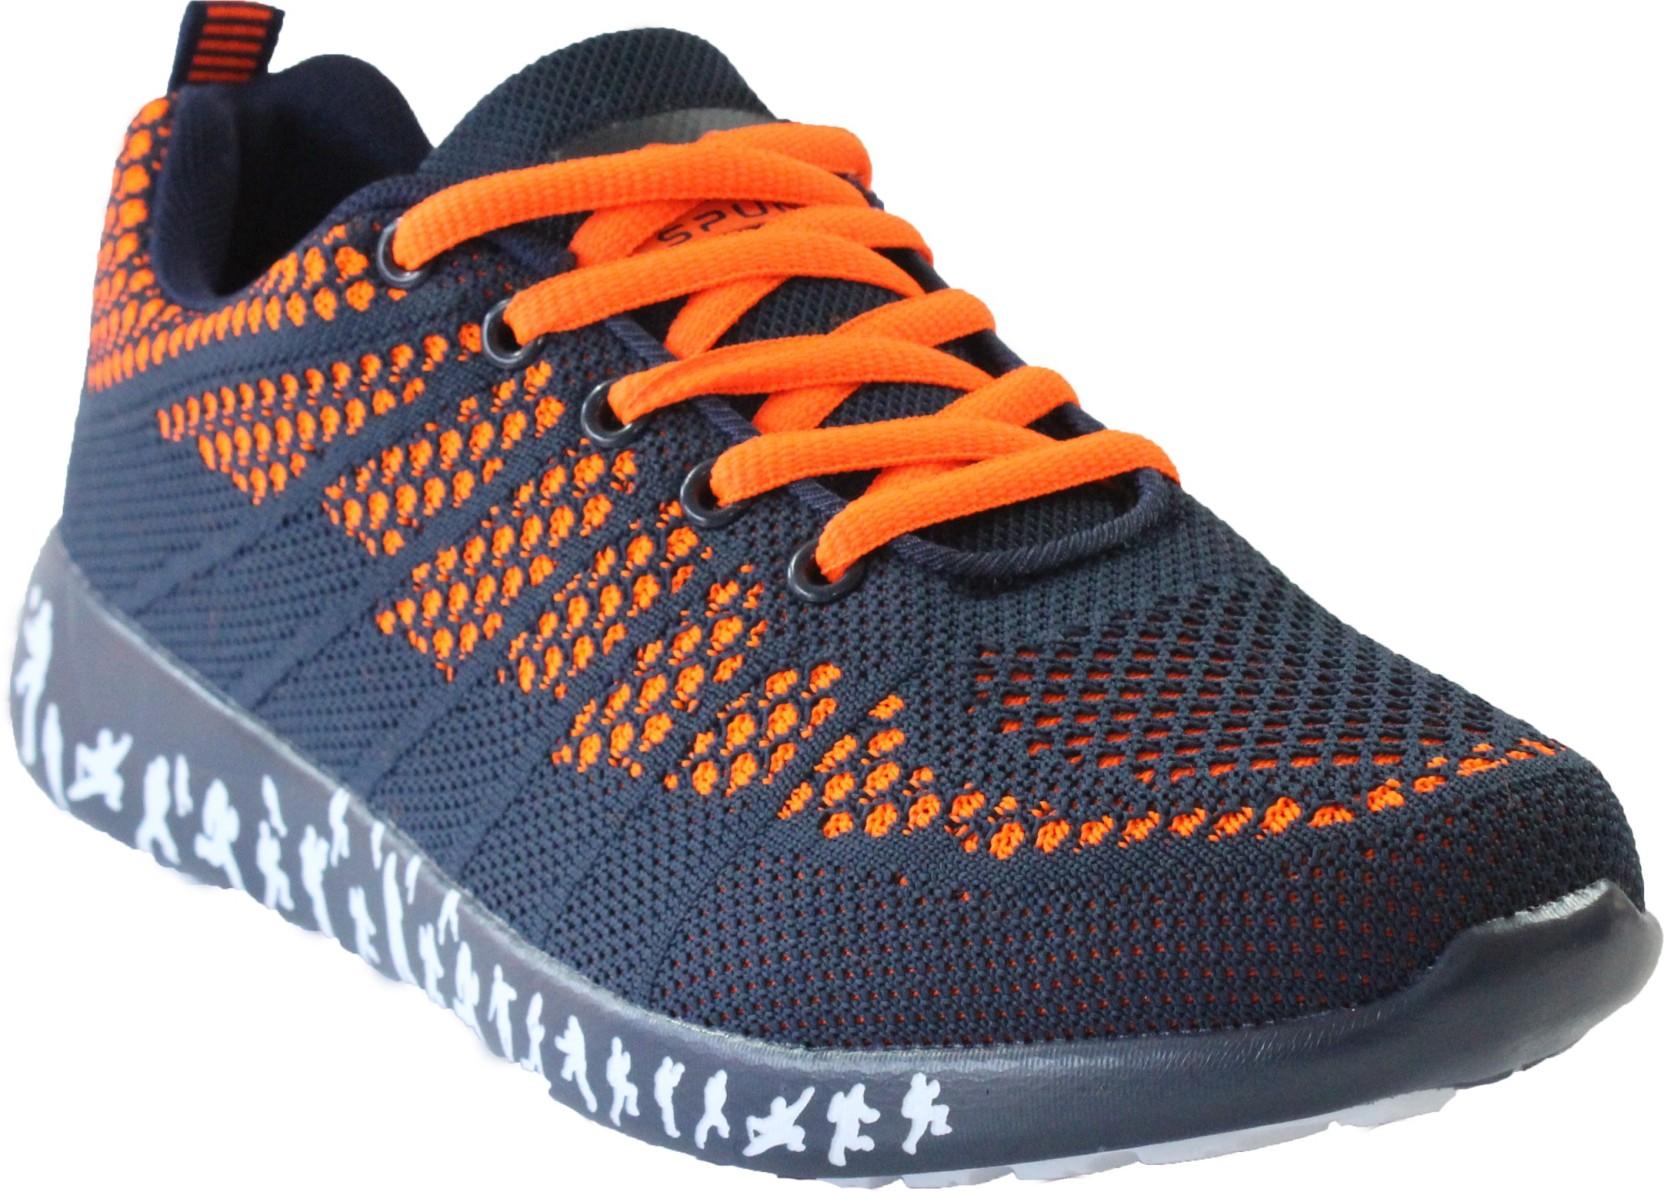 cfc9ee2faf5 Spunk by FBB Running Shoes For Men - Buy Spunk by FBB Running Shoes ...